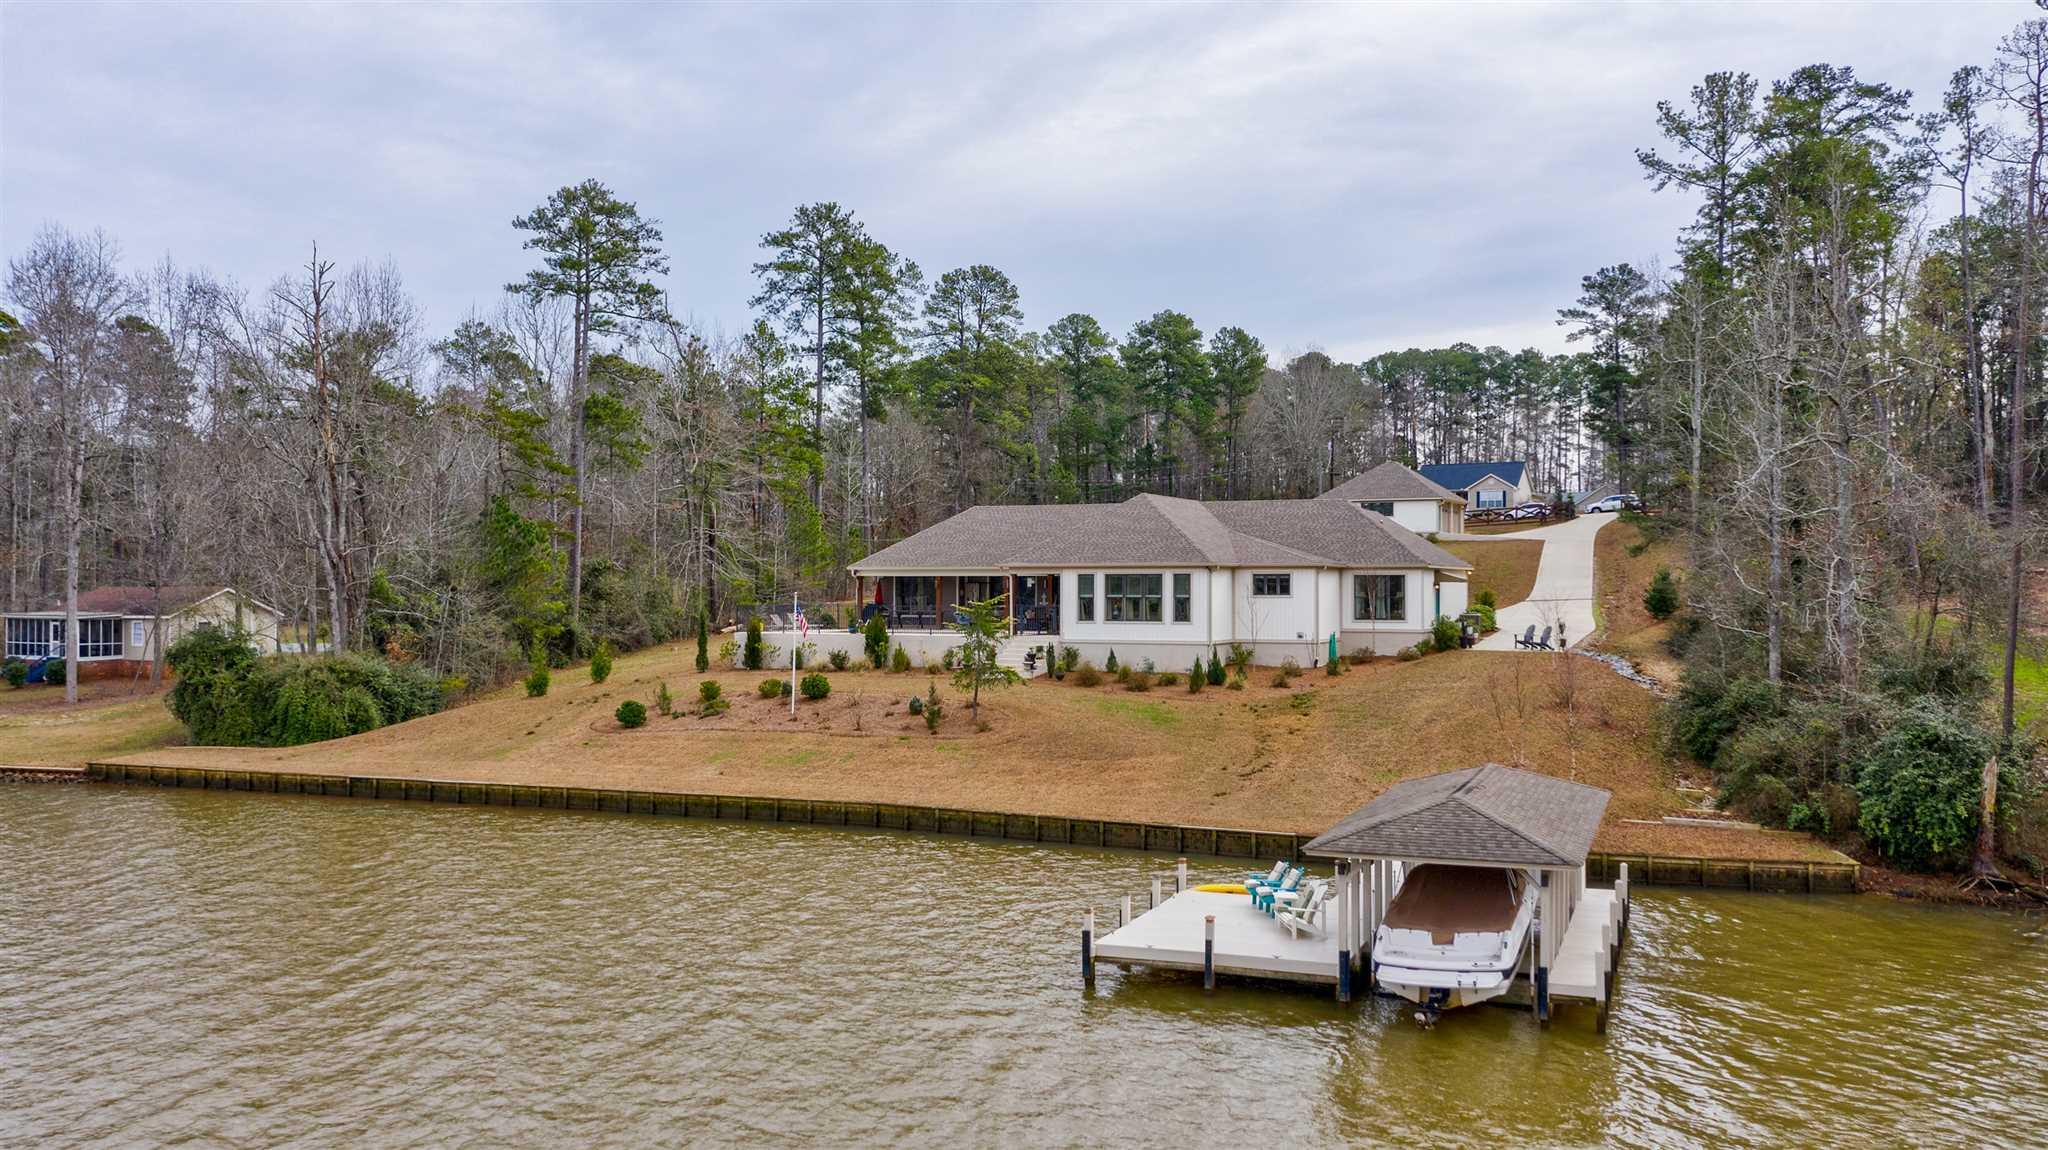 171 BILL JOHNSON ROAD, Lake Sinclair in Baldwin County, GA 31061 Home for Sale